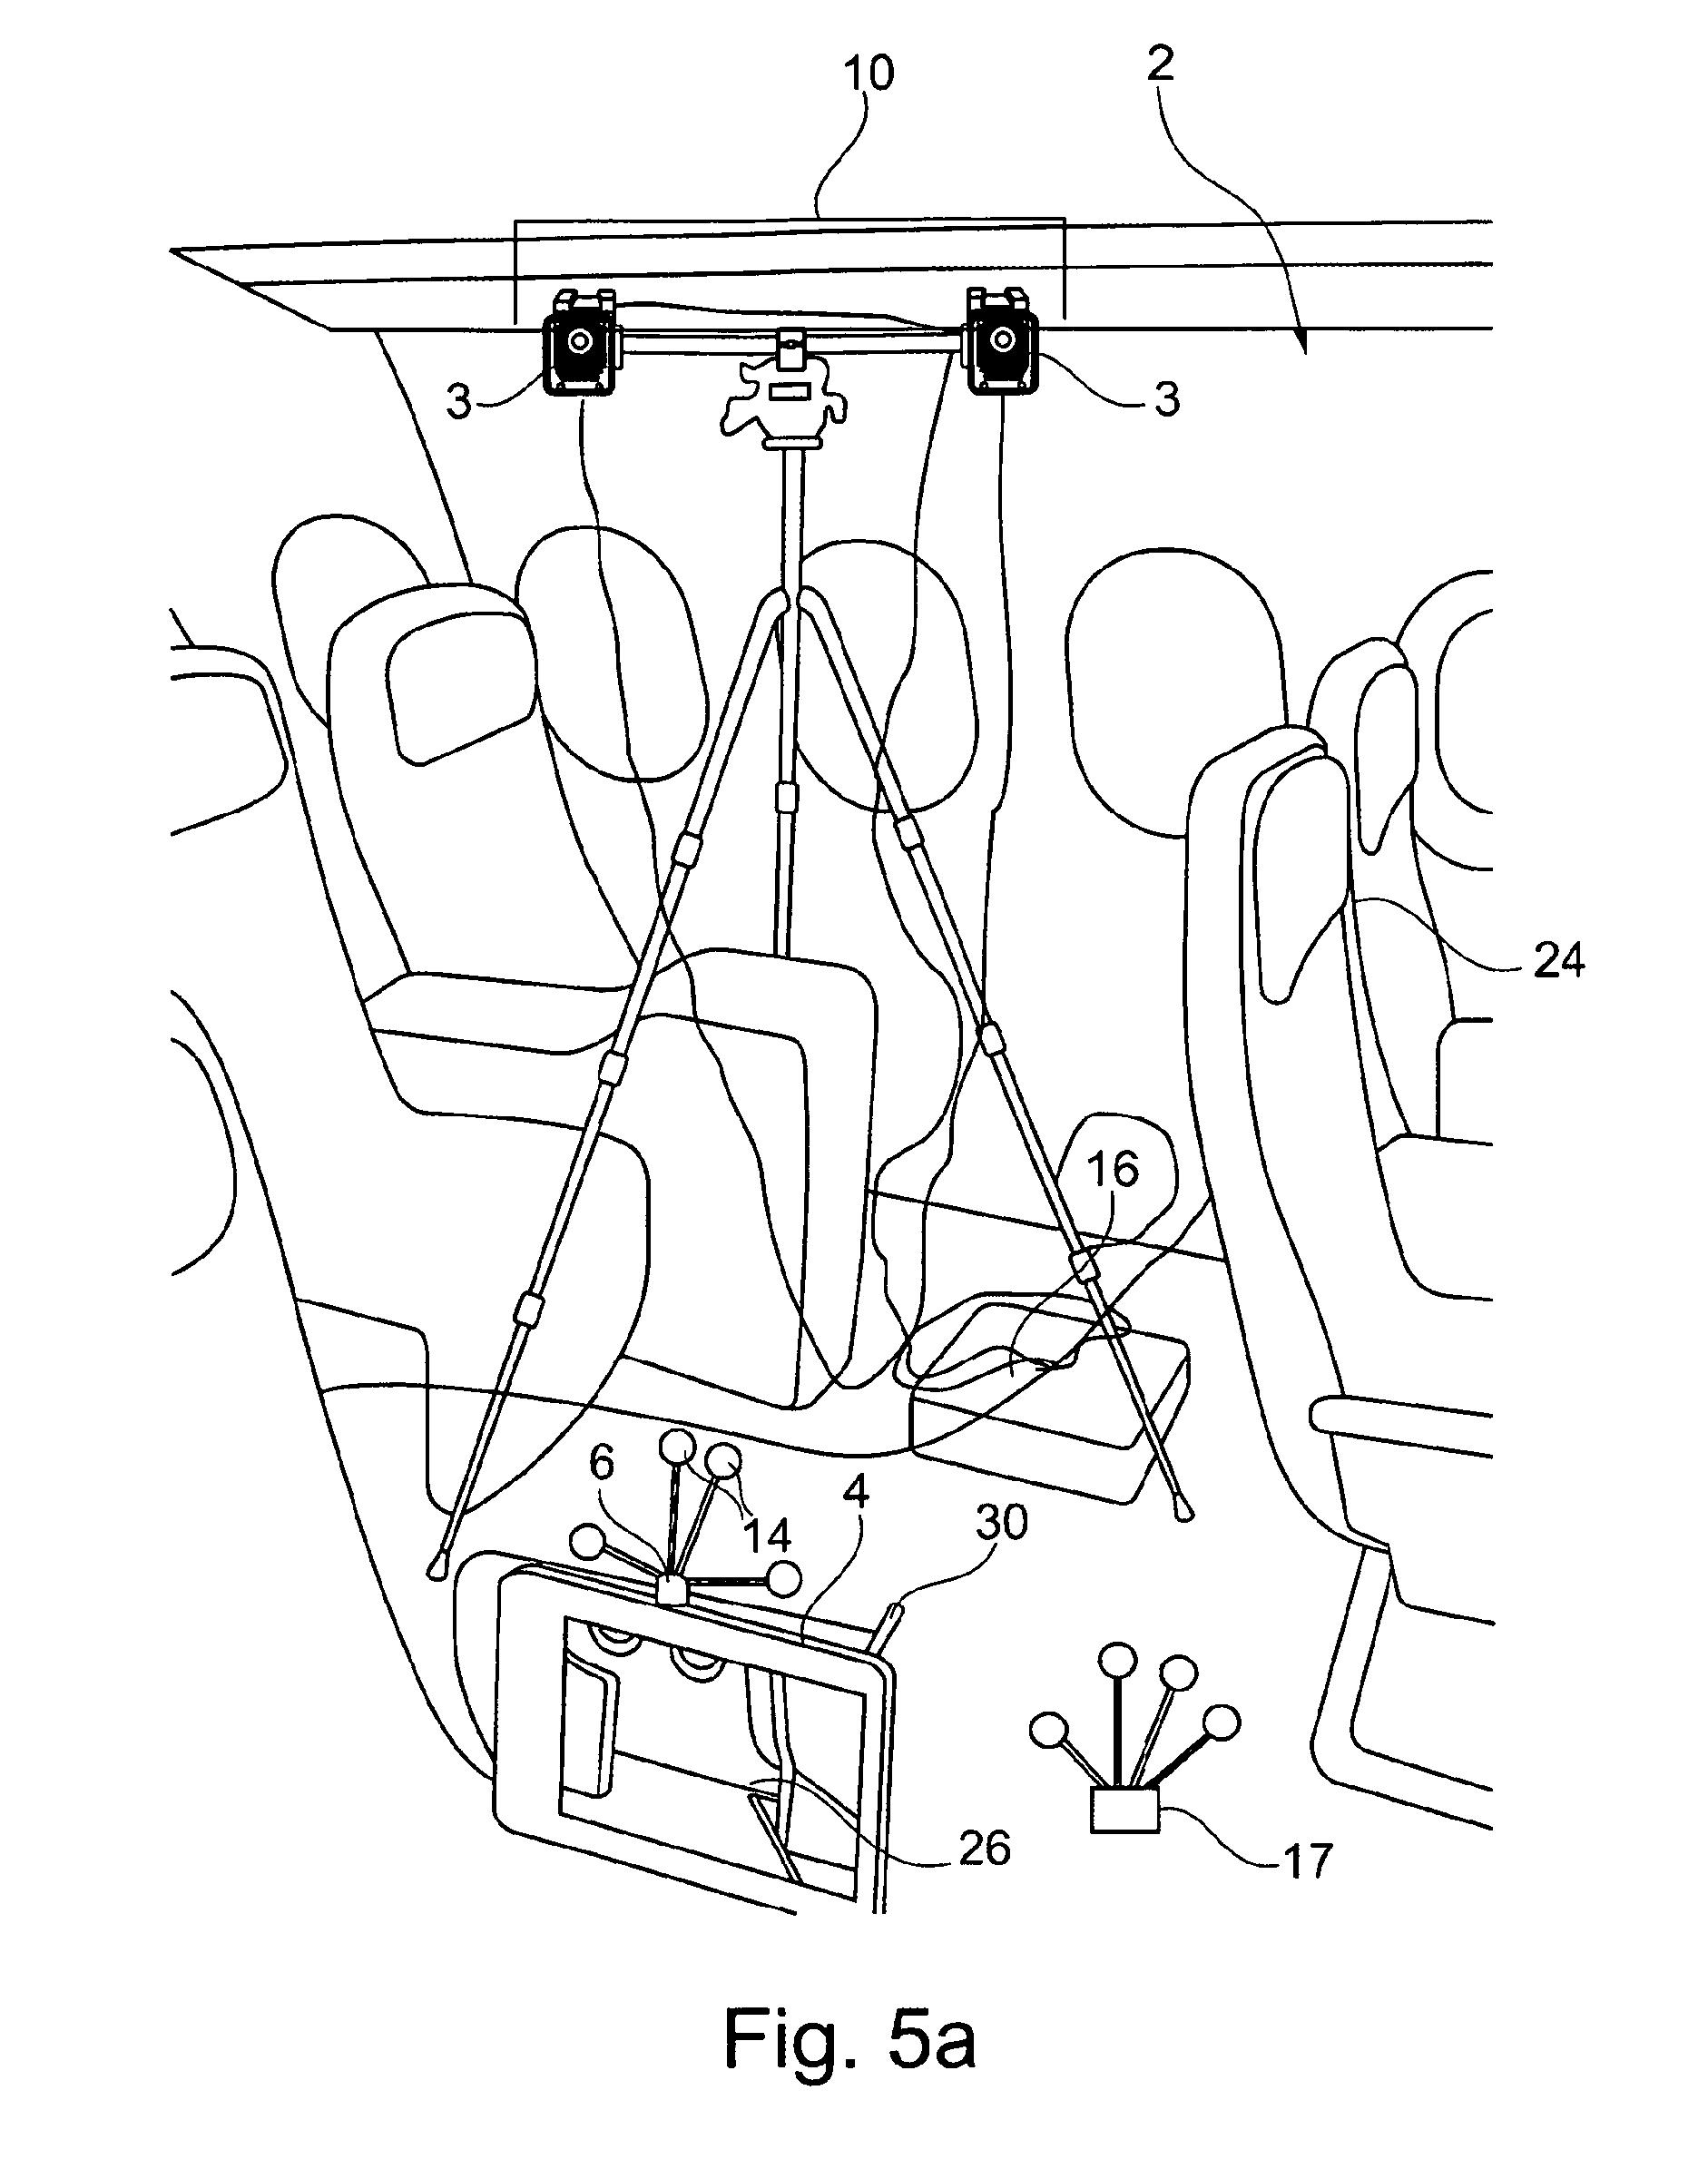 Rheostat Wiring Diagram Solidfonts – Rth2300 Wiring Diagram